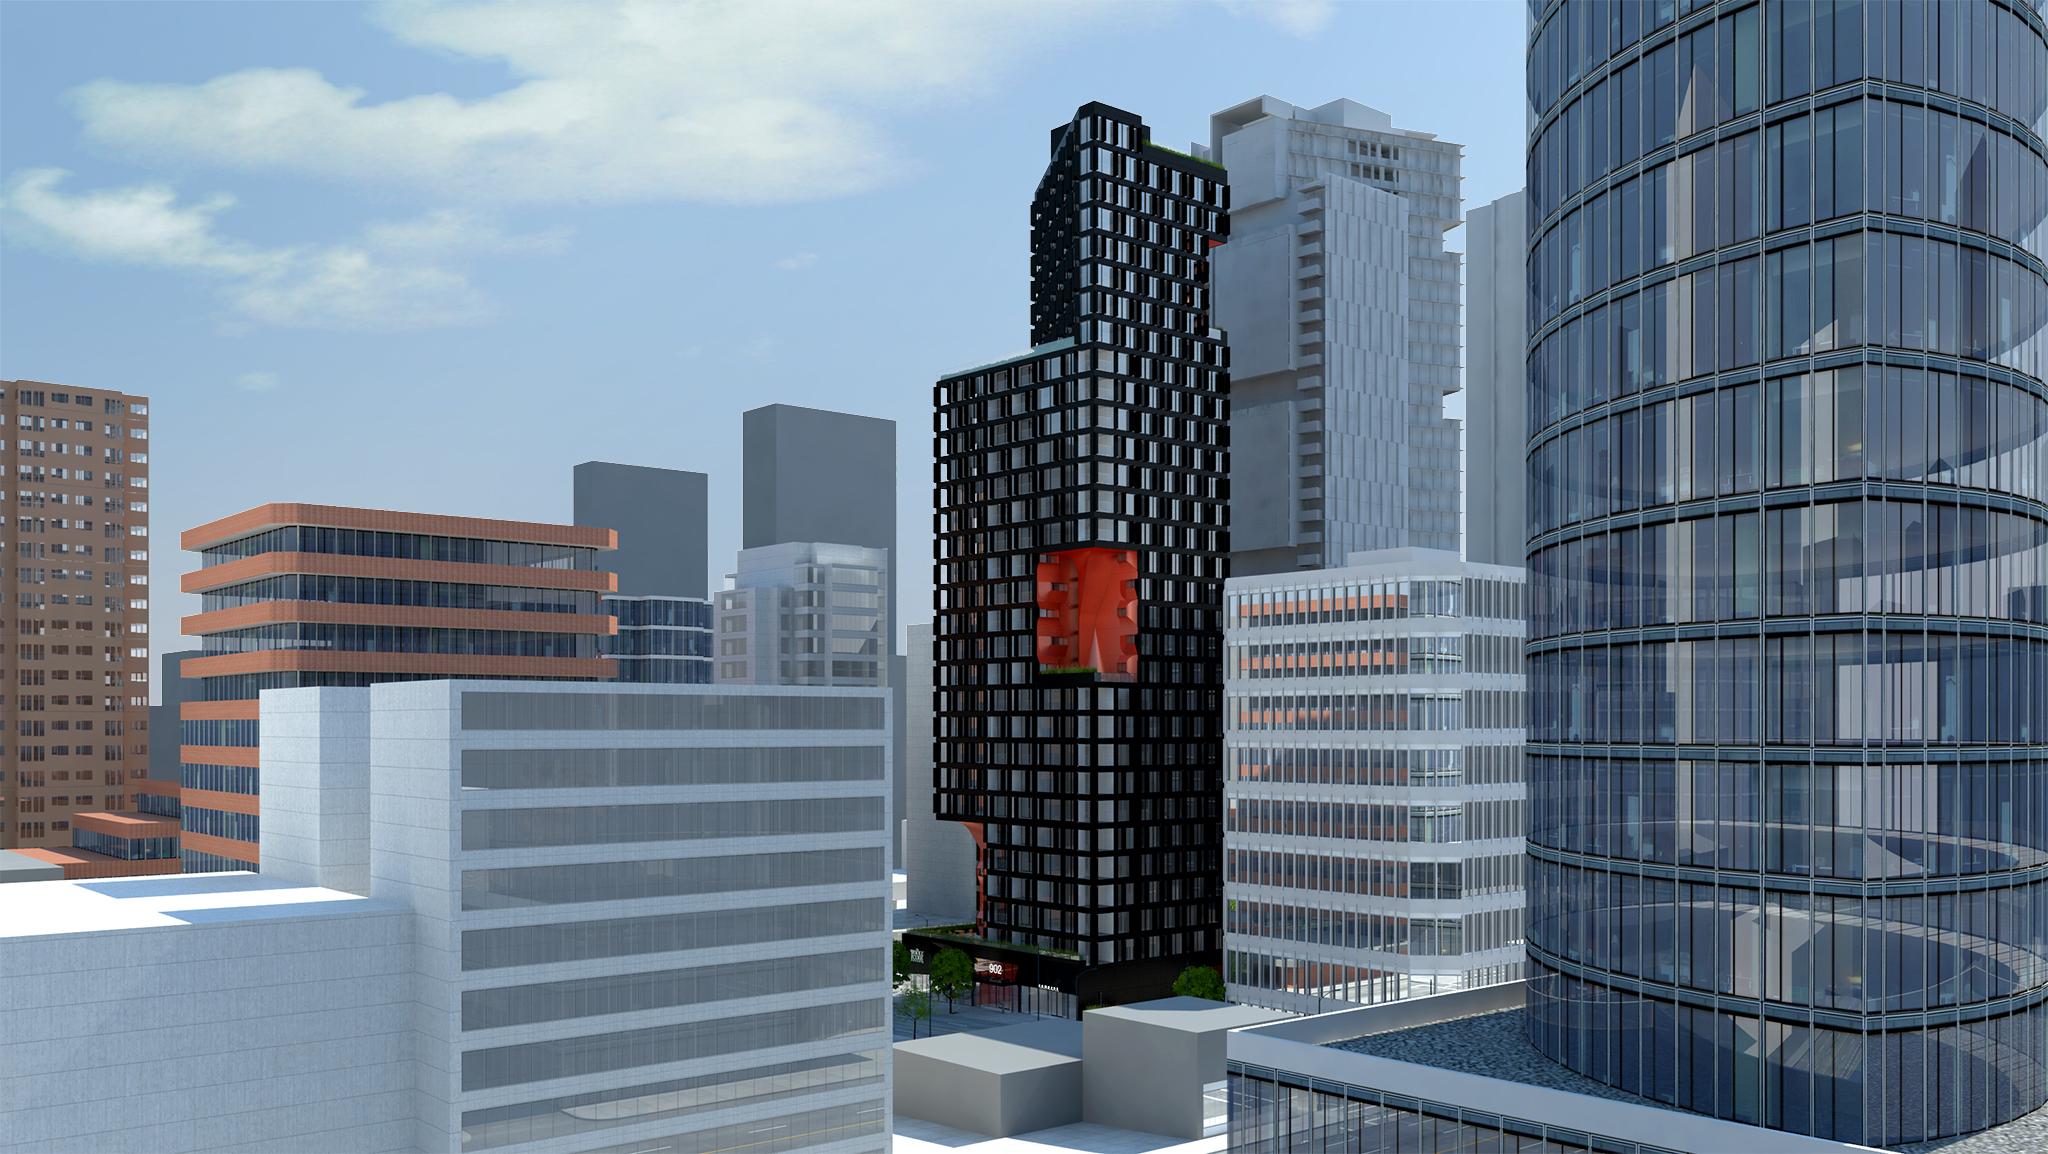 902-Davie-Street-Elliot Funt- Presale Micro Loft.jpg